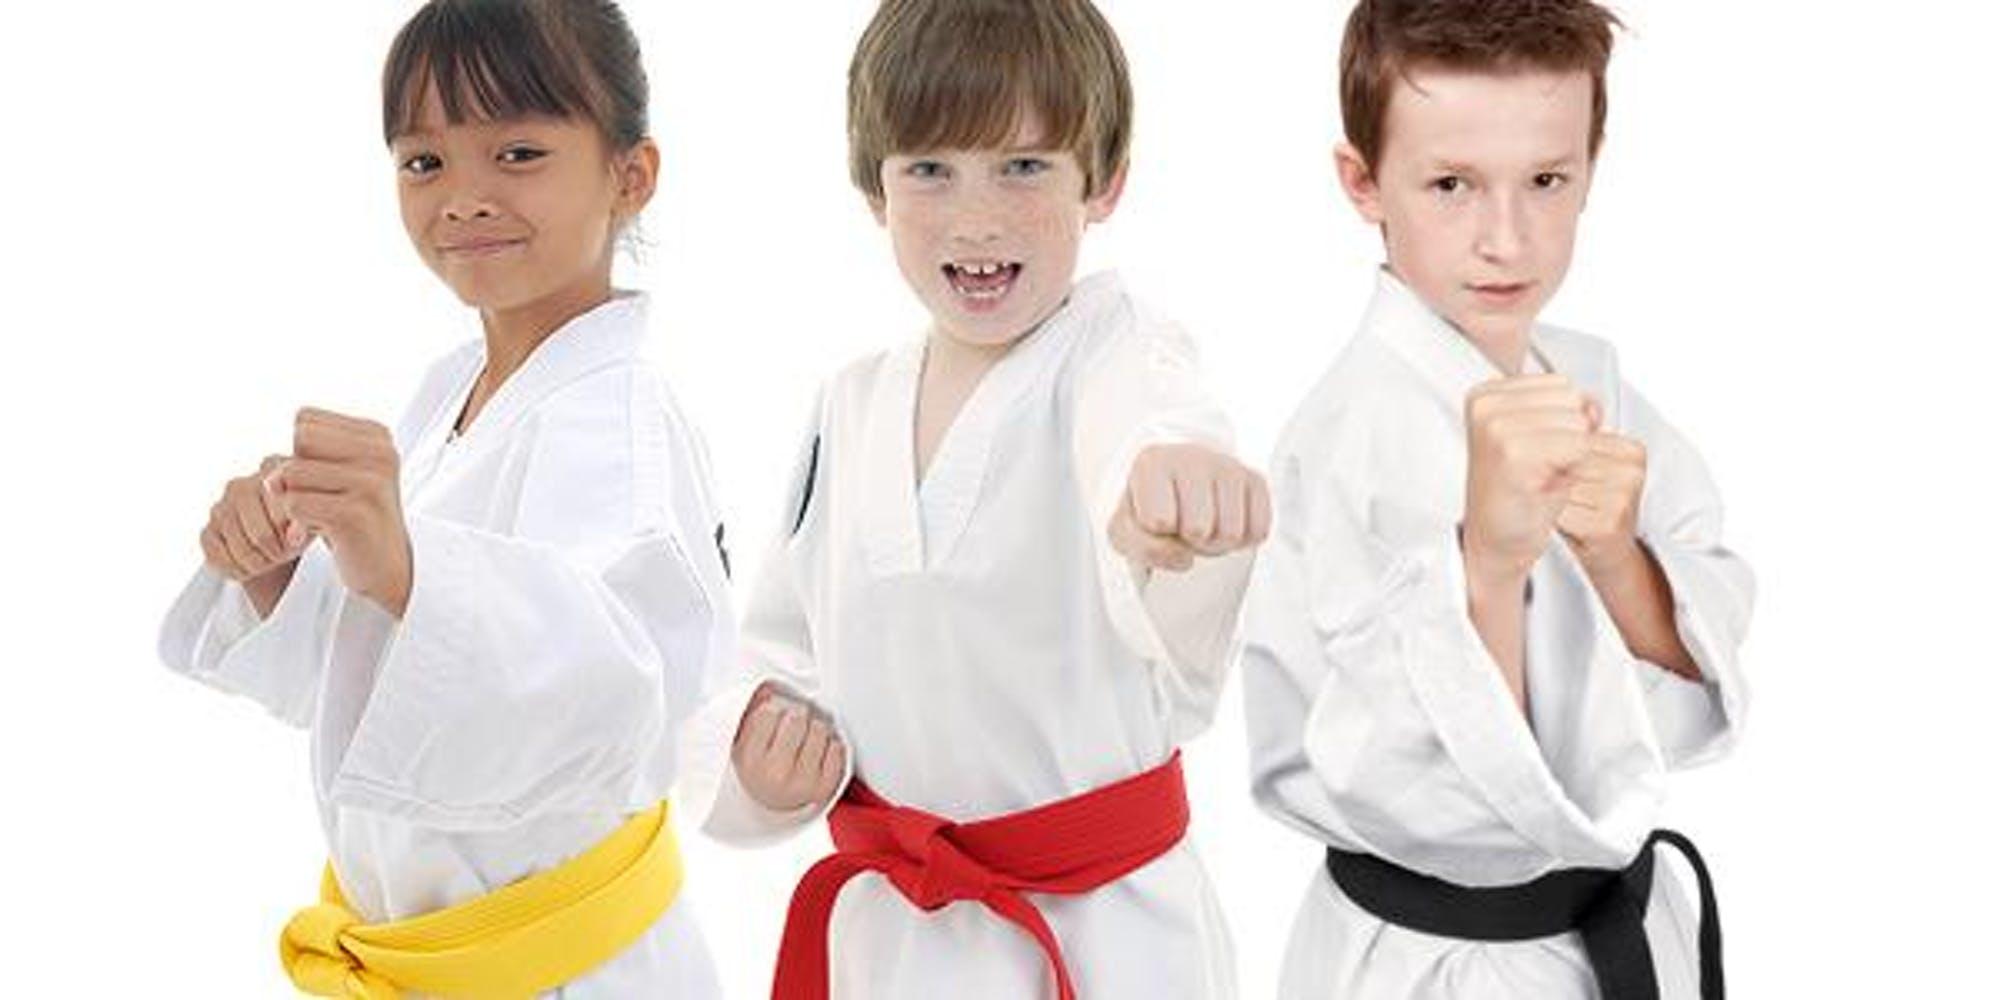 kids_taekwondo_brazilian_jiu_jitsu.jpg